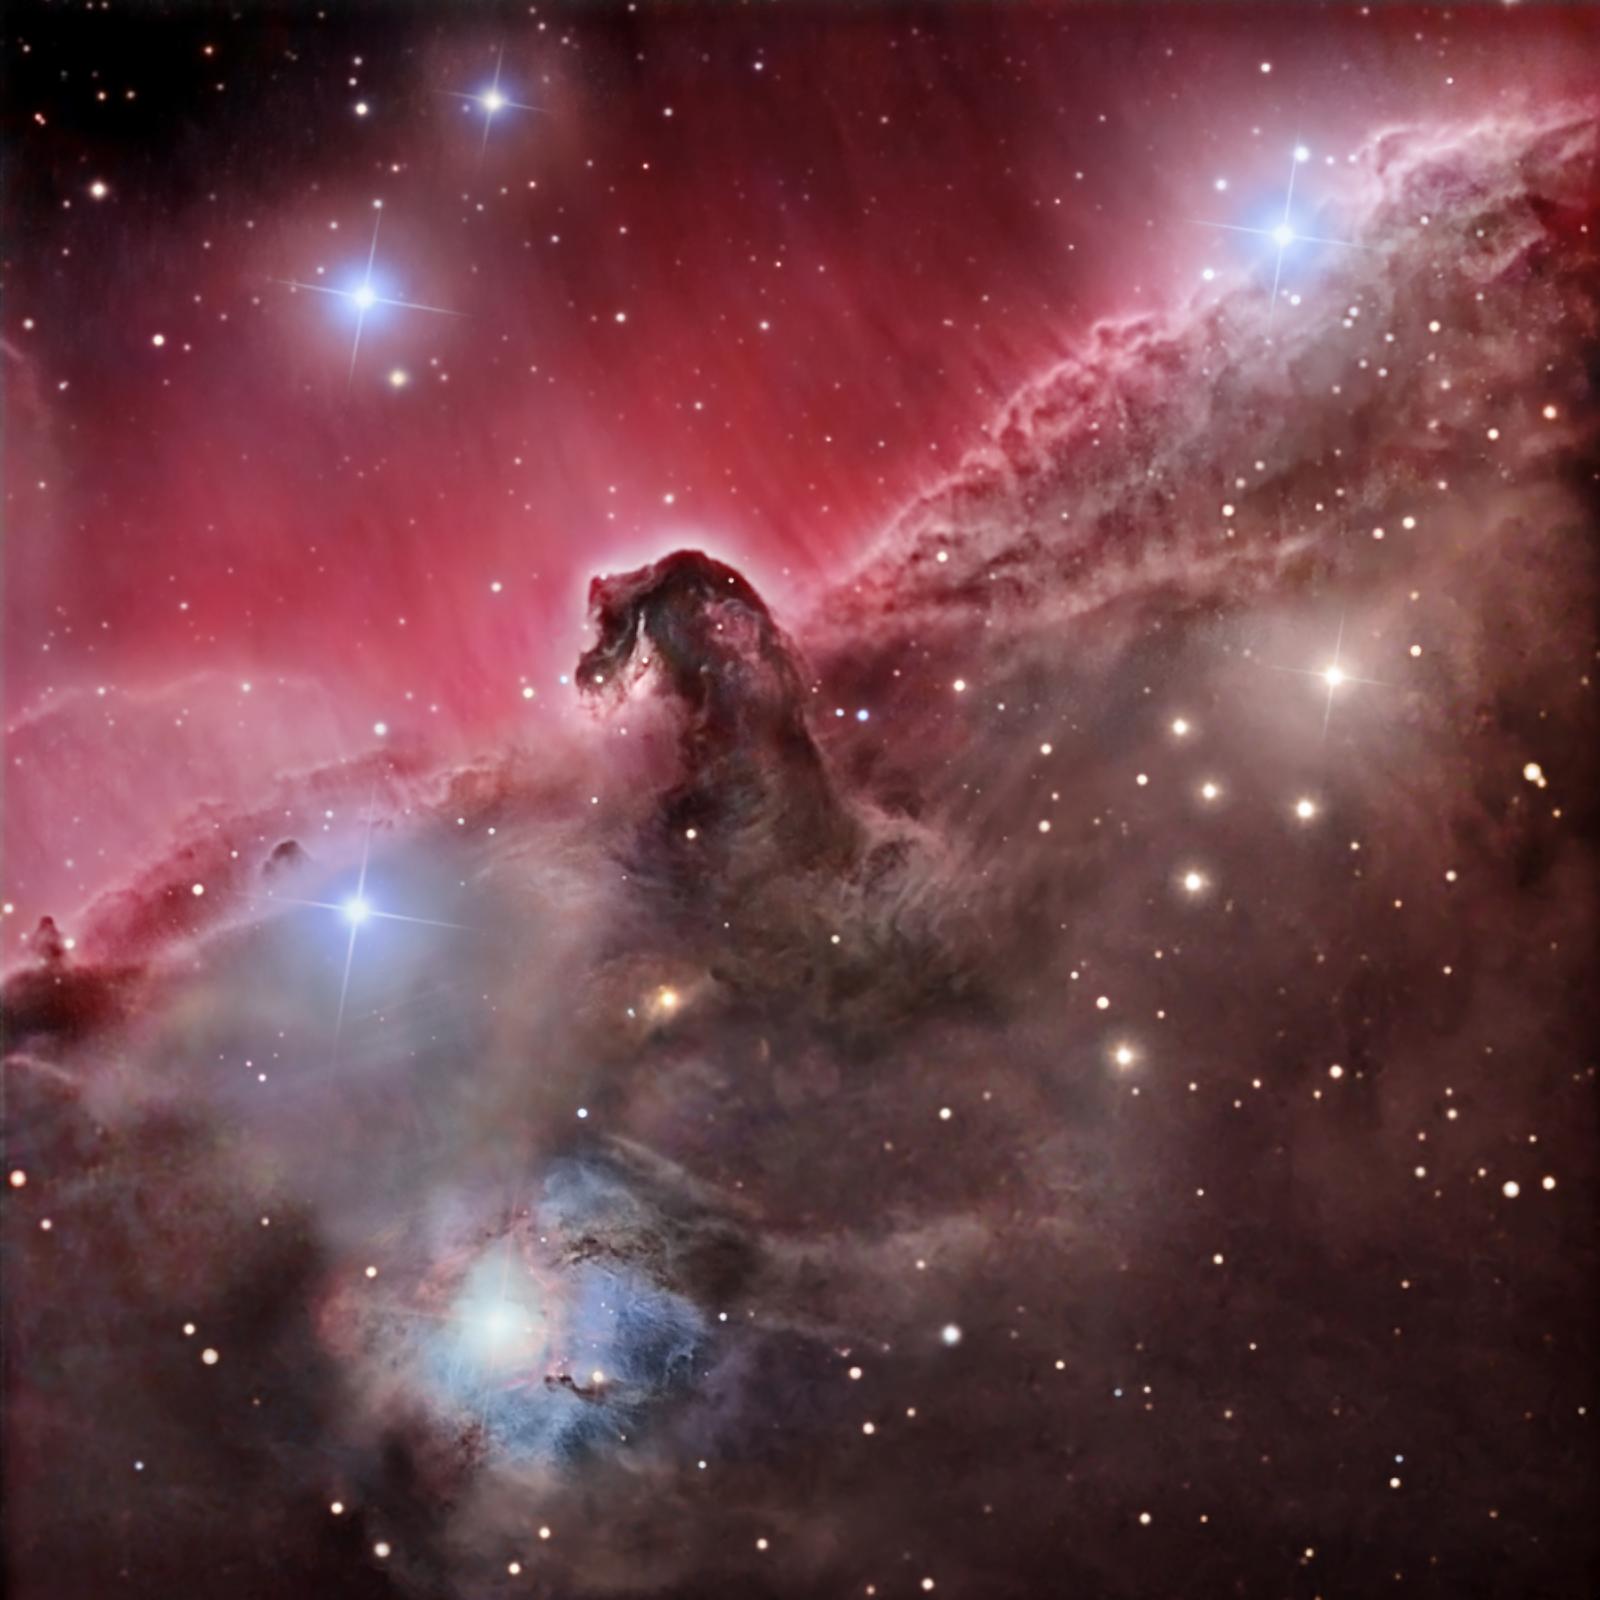 nebula in orion the horsehead nebula - photo #9